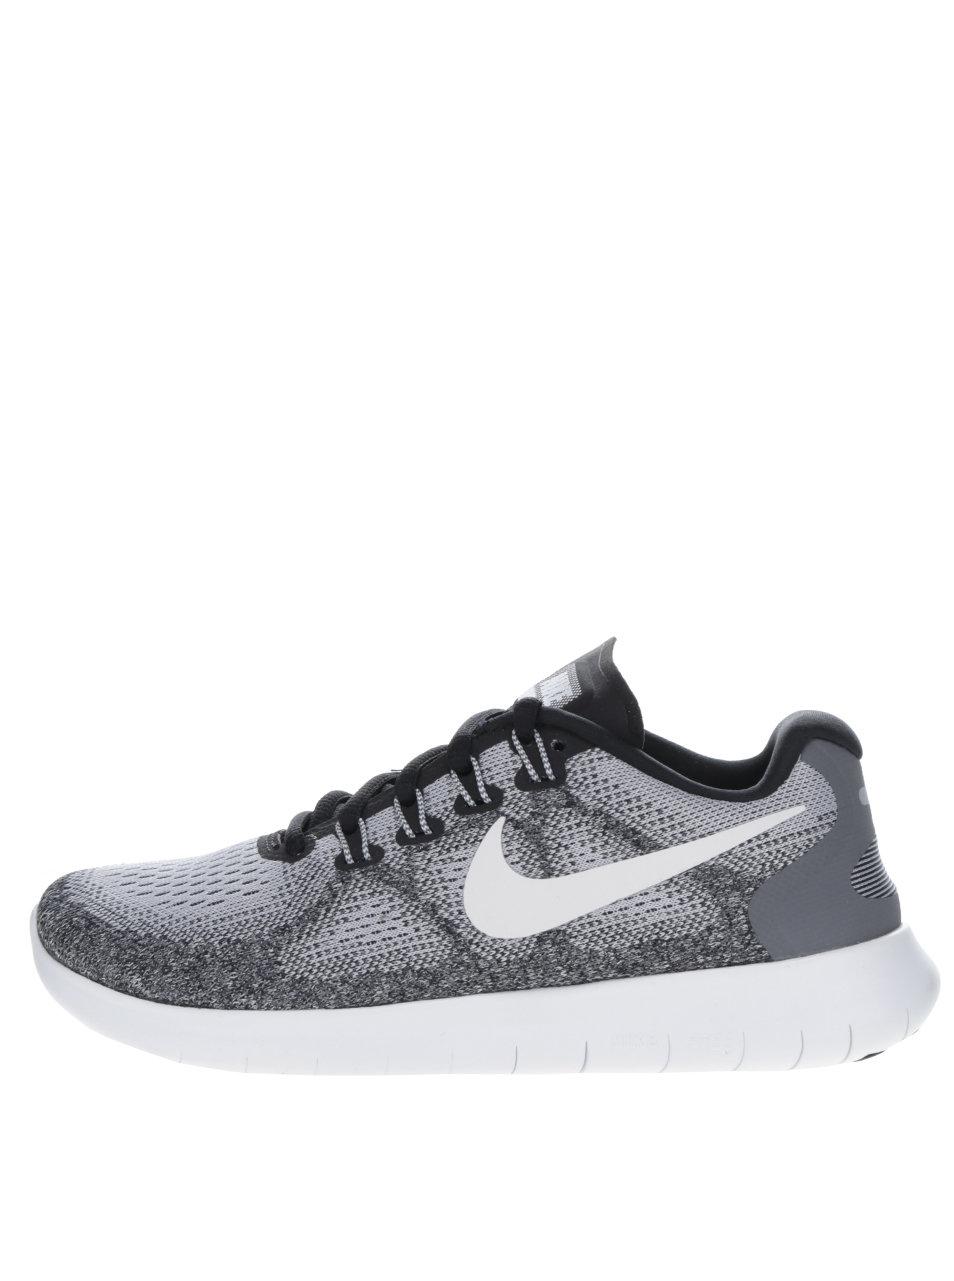 391b5716562d Sivé dámske tenisky Nike Free run ...